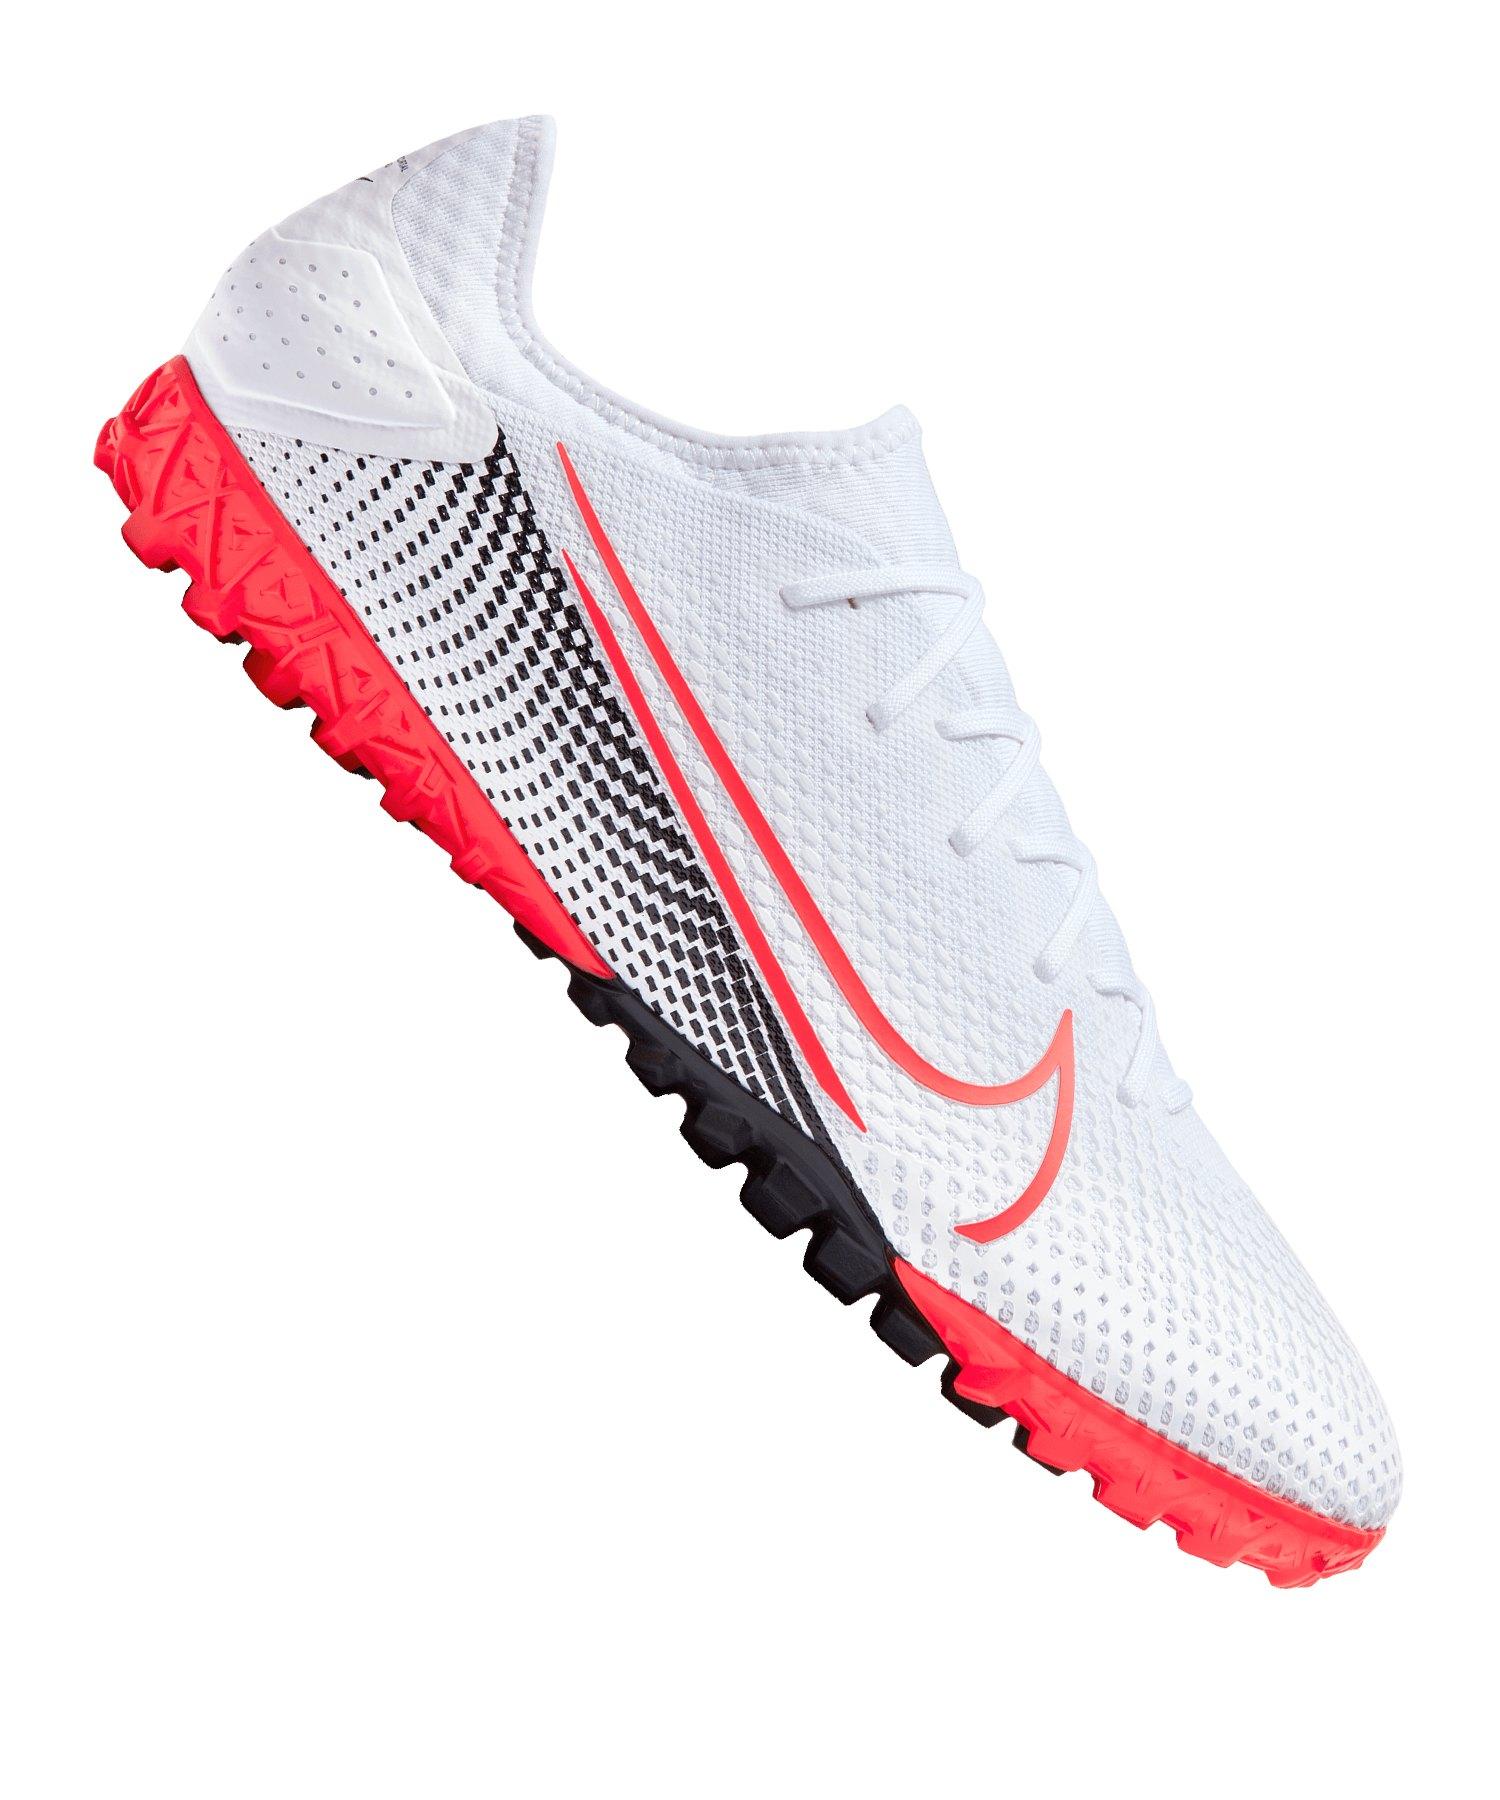 Nike Mercurial Vapor XIII Future Lab II Pro TF Weiss F160 - weiss